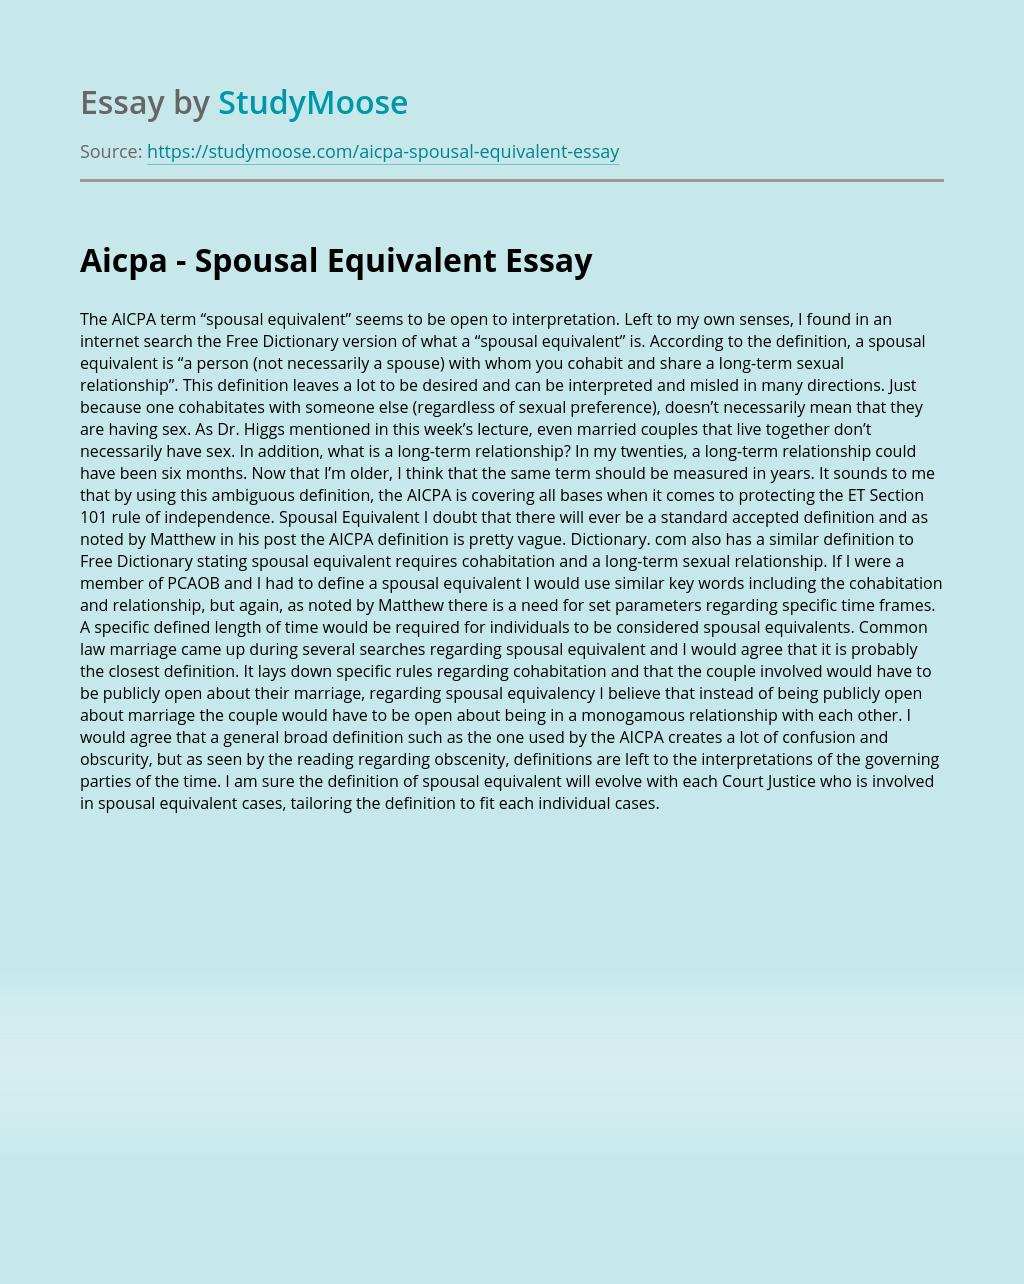 Aicpa - Spousal Equivalent